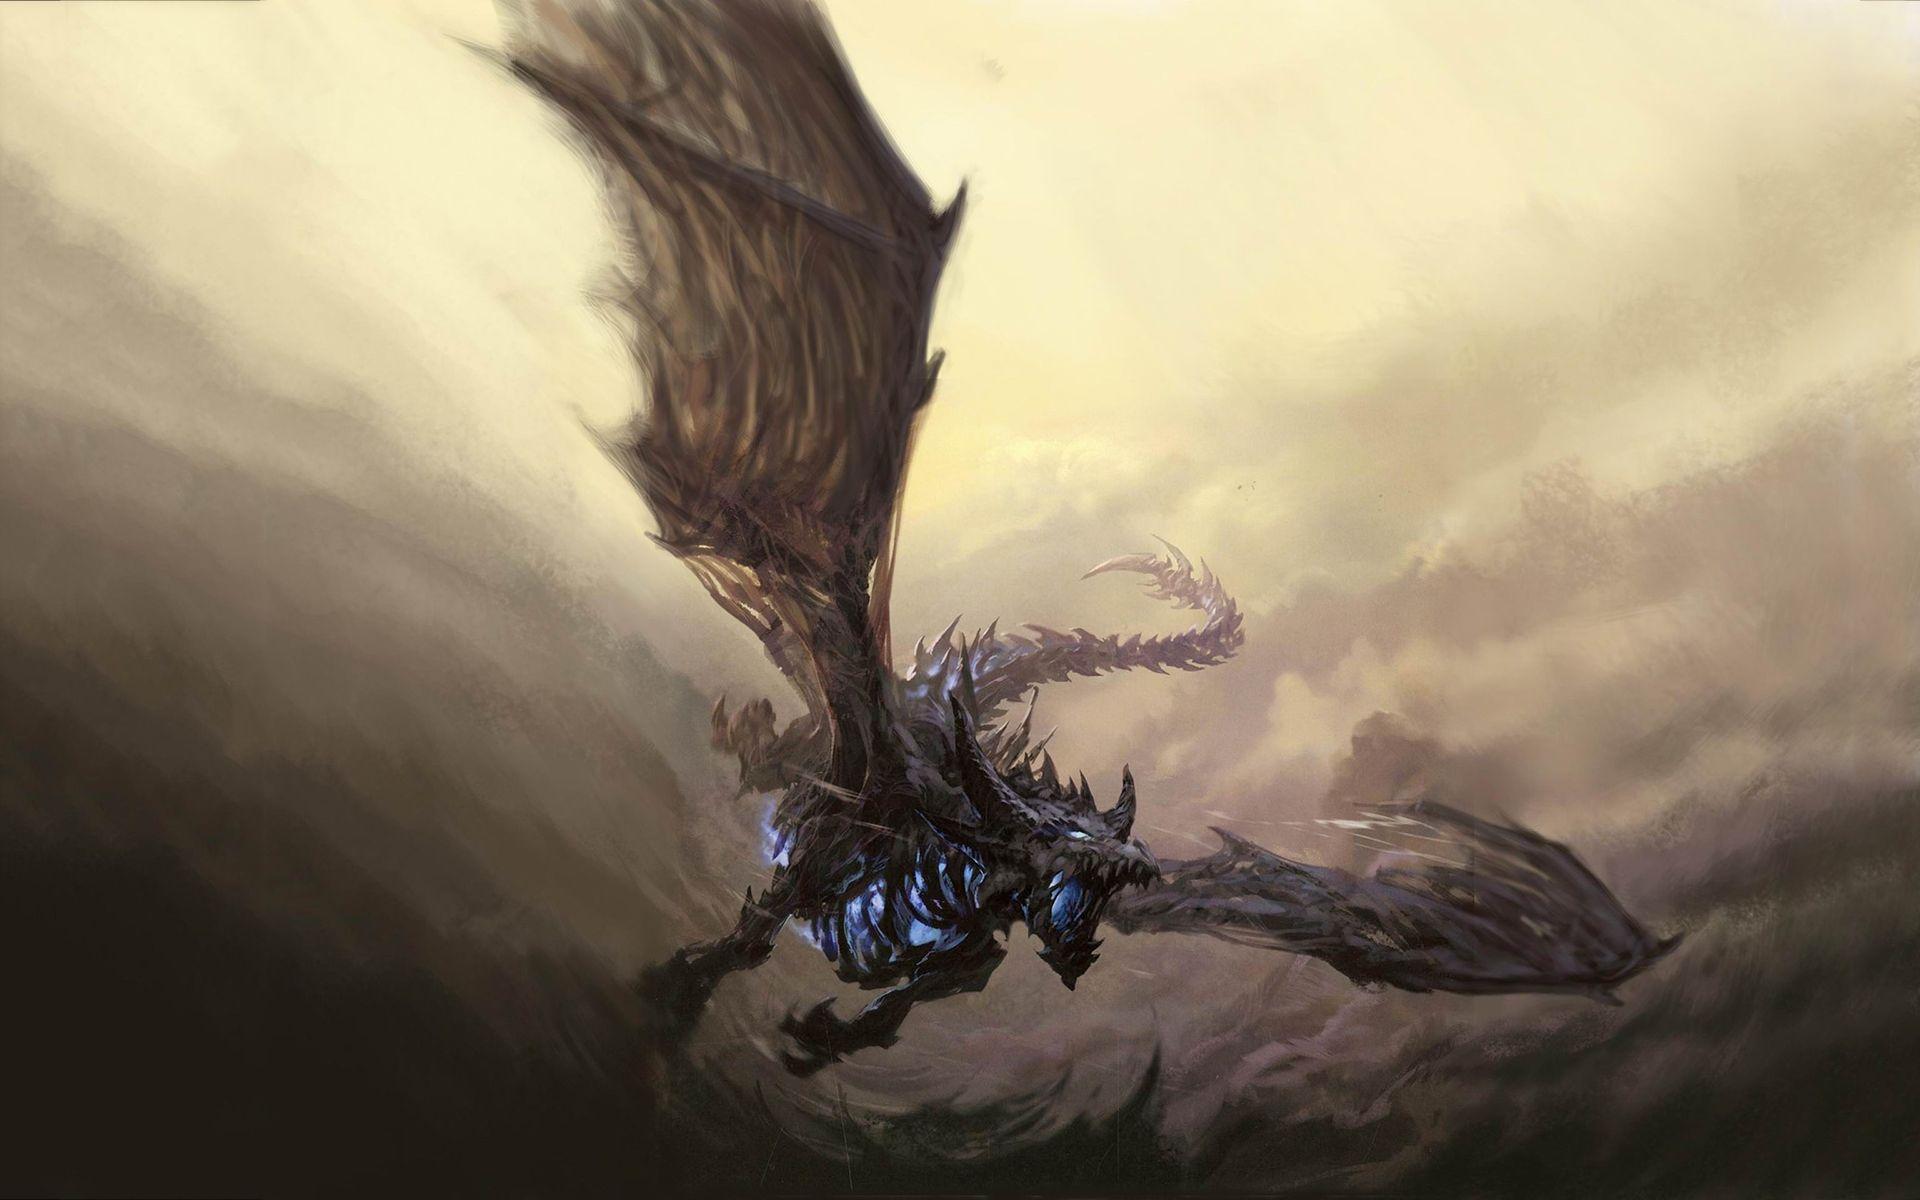 Fantasy Dragons Images Dragon Fantasy Art Wallpapers Pictures Fantasy Dragon Fantasy Artwork Dragon Images